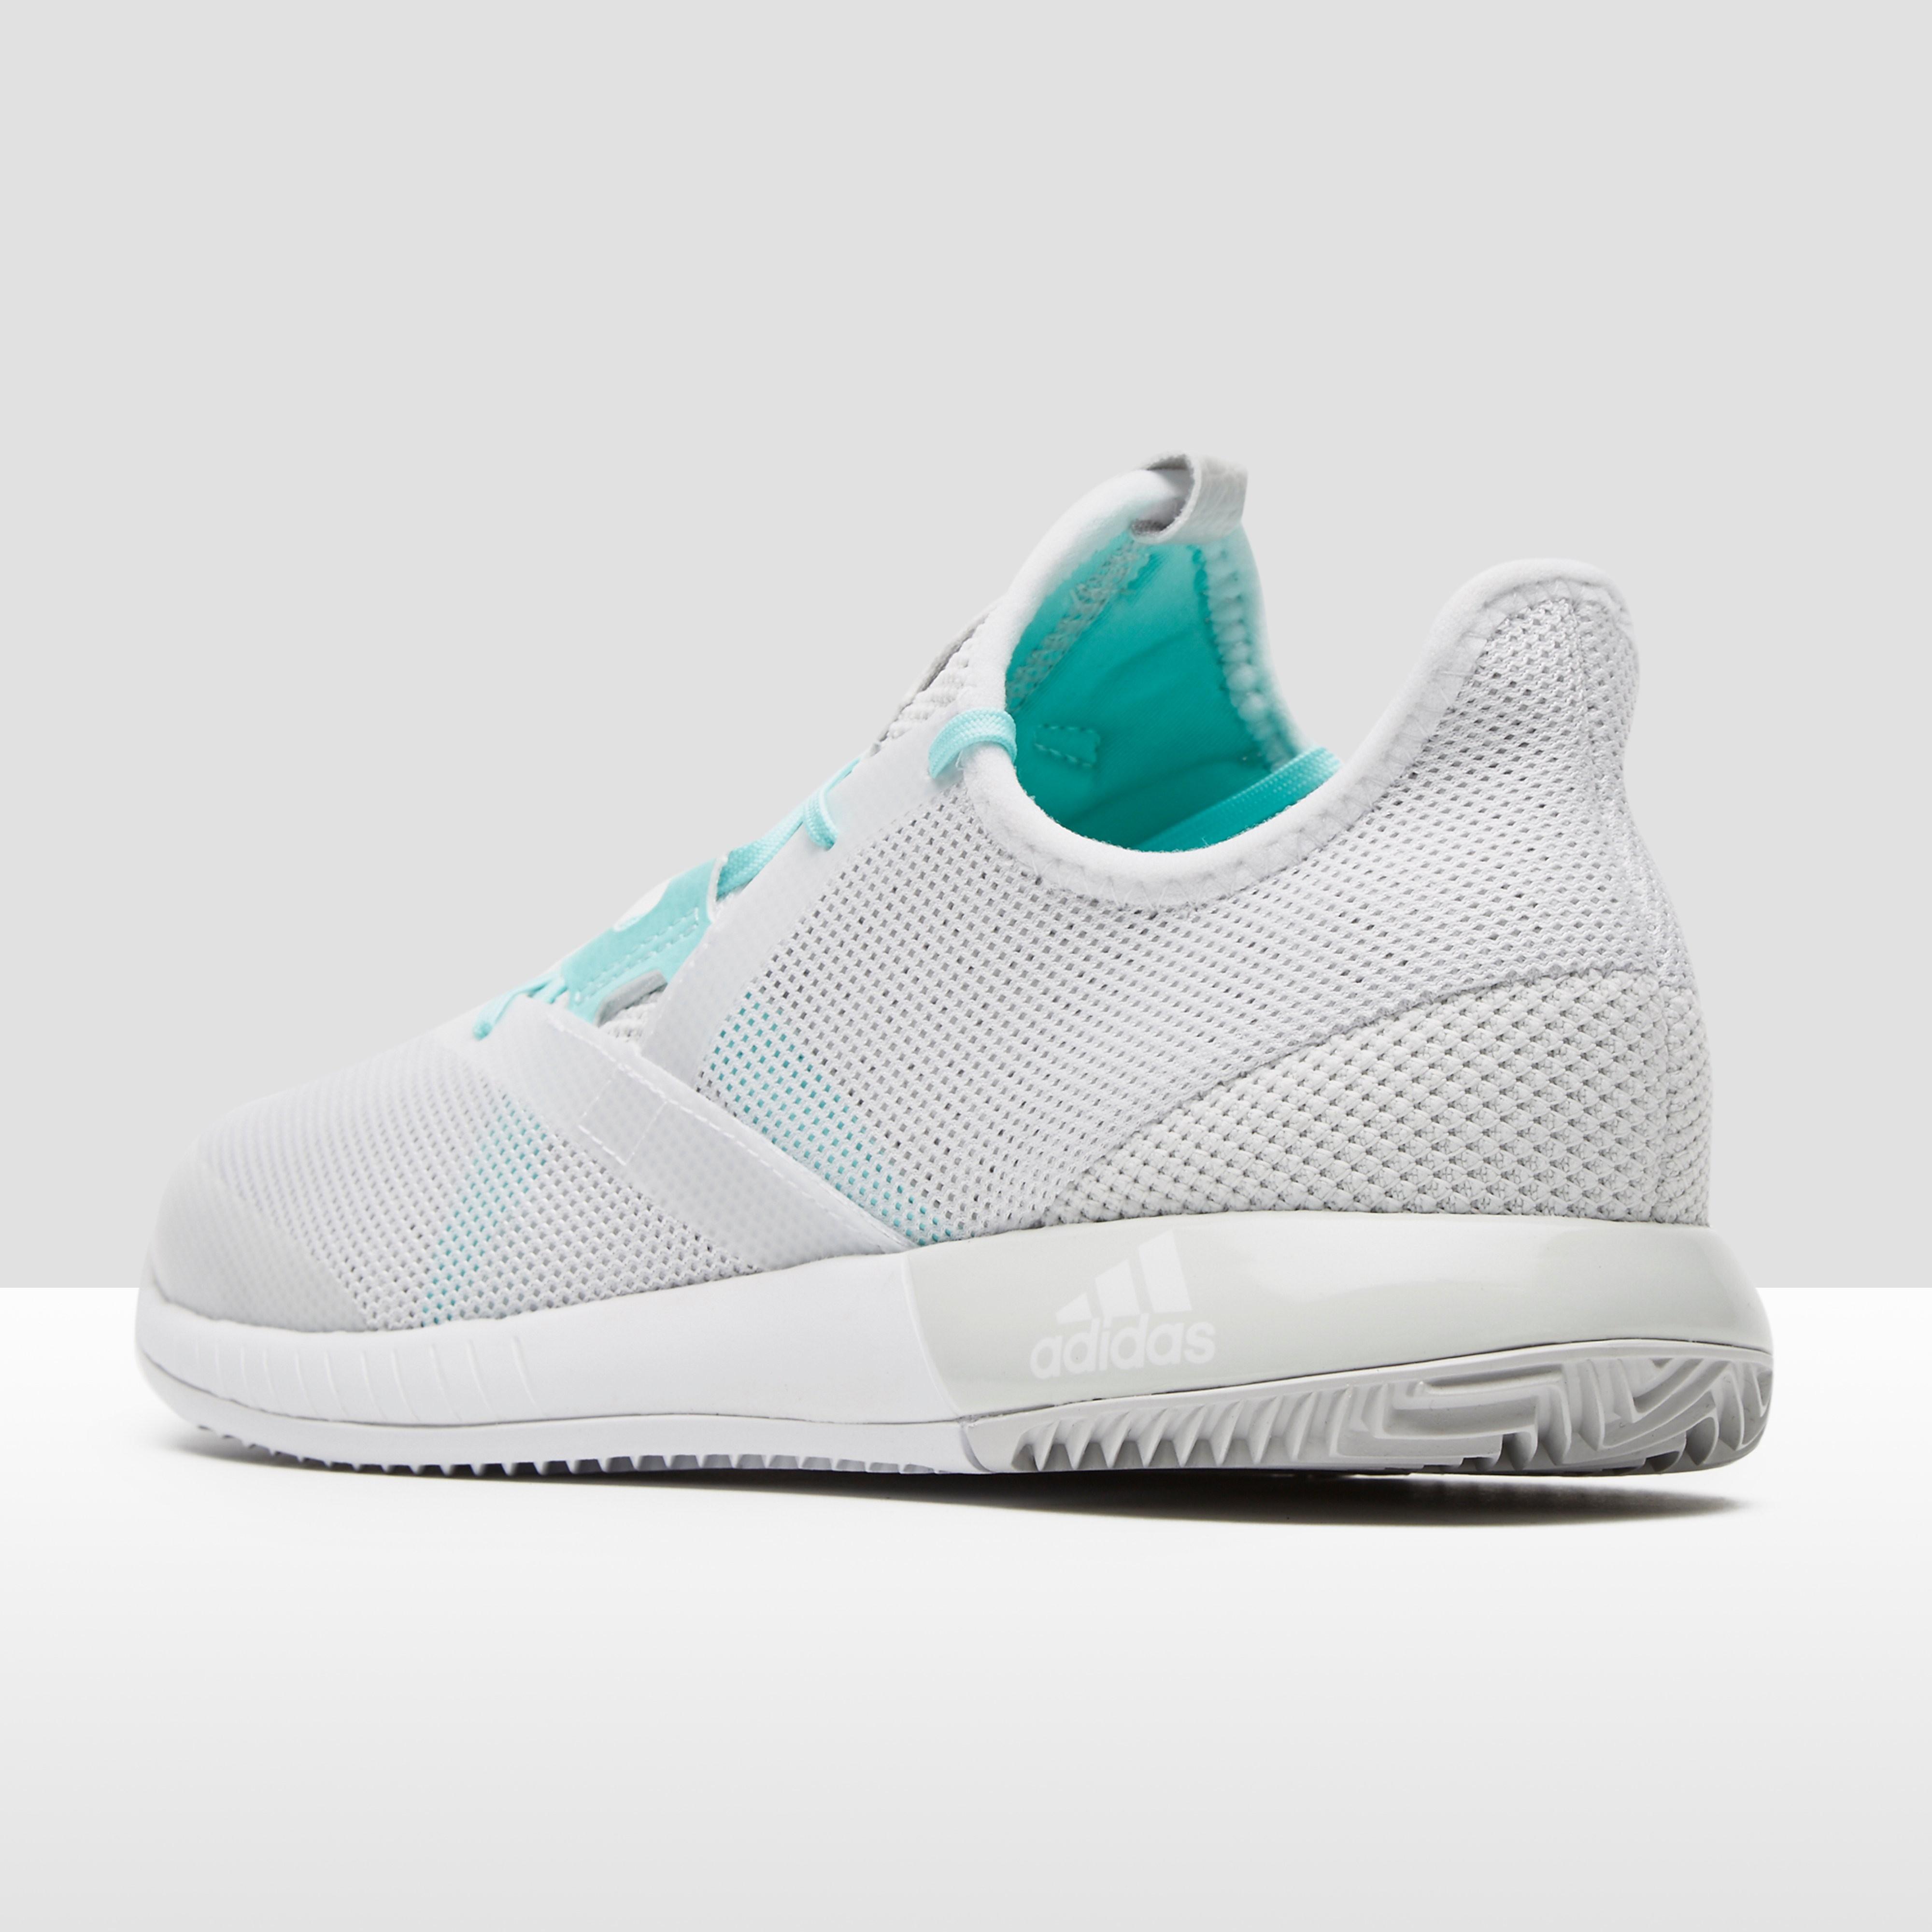 adidas AdiZero Defiant Bounce Women's Tennis Shoe